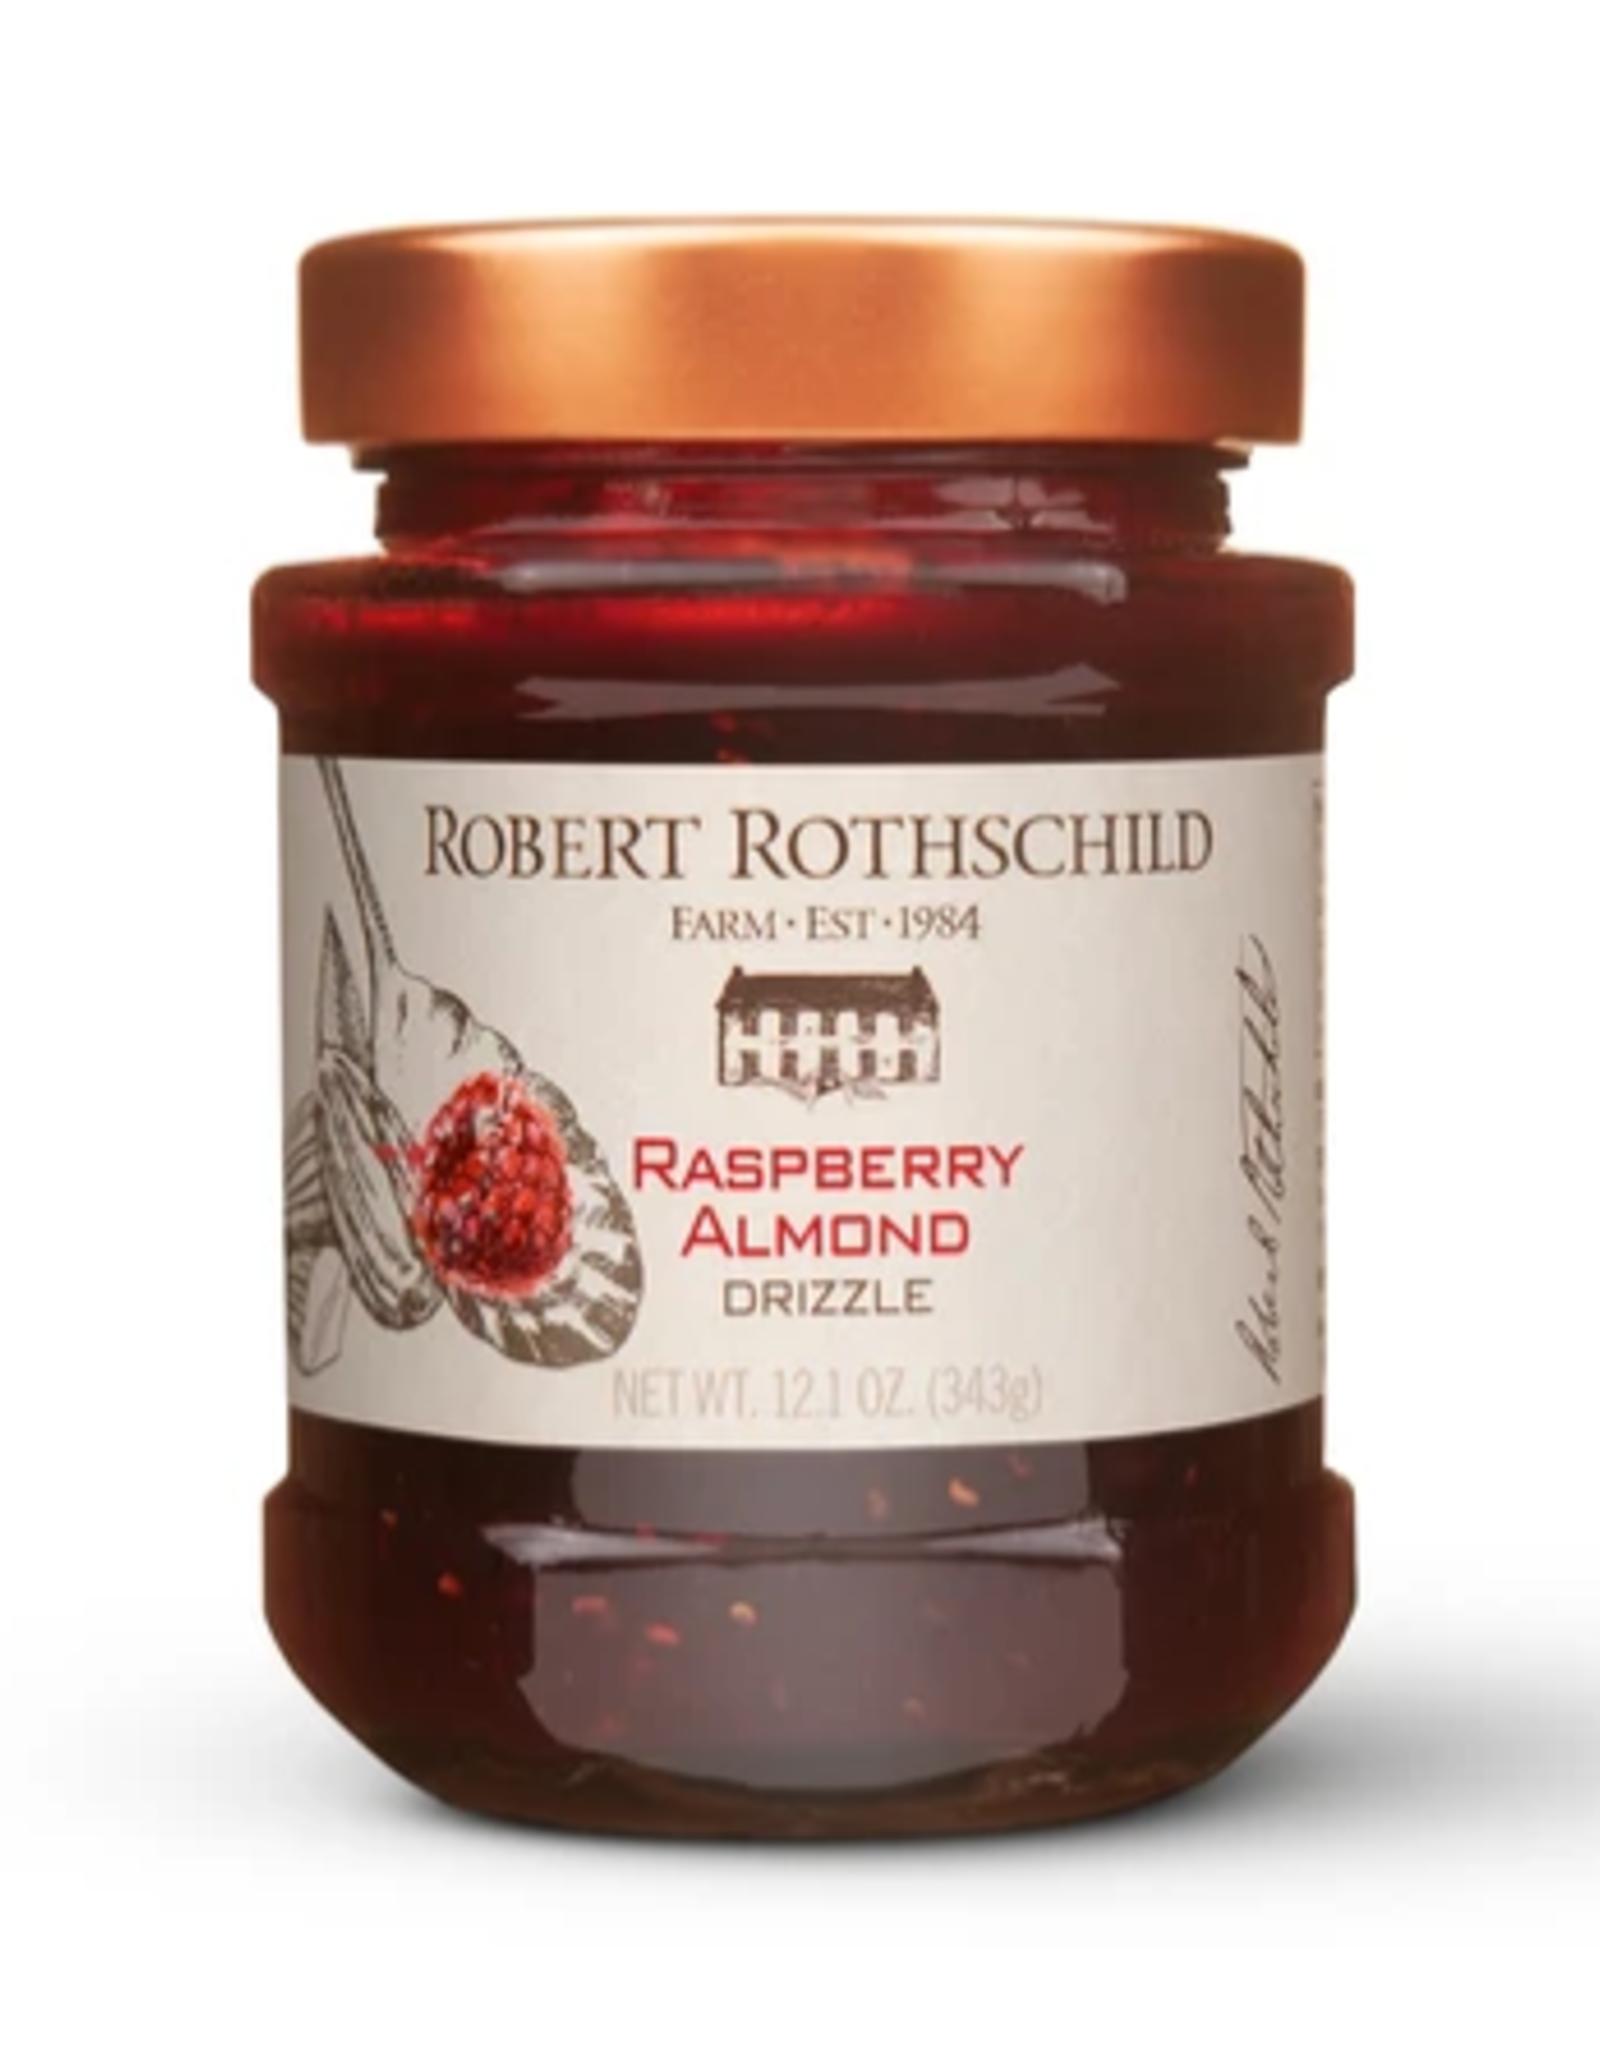 Robert Rothschild Raspberry Almond Drizzle